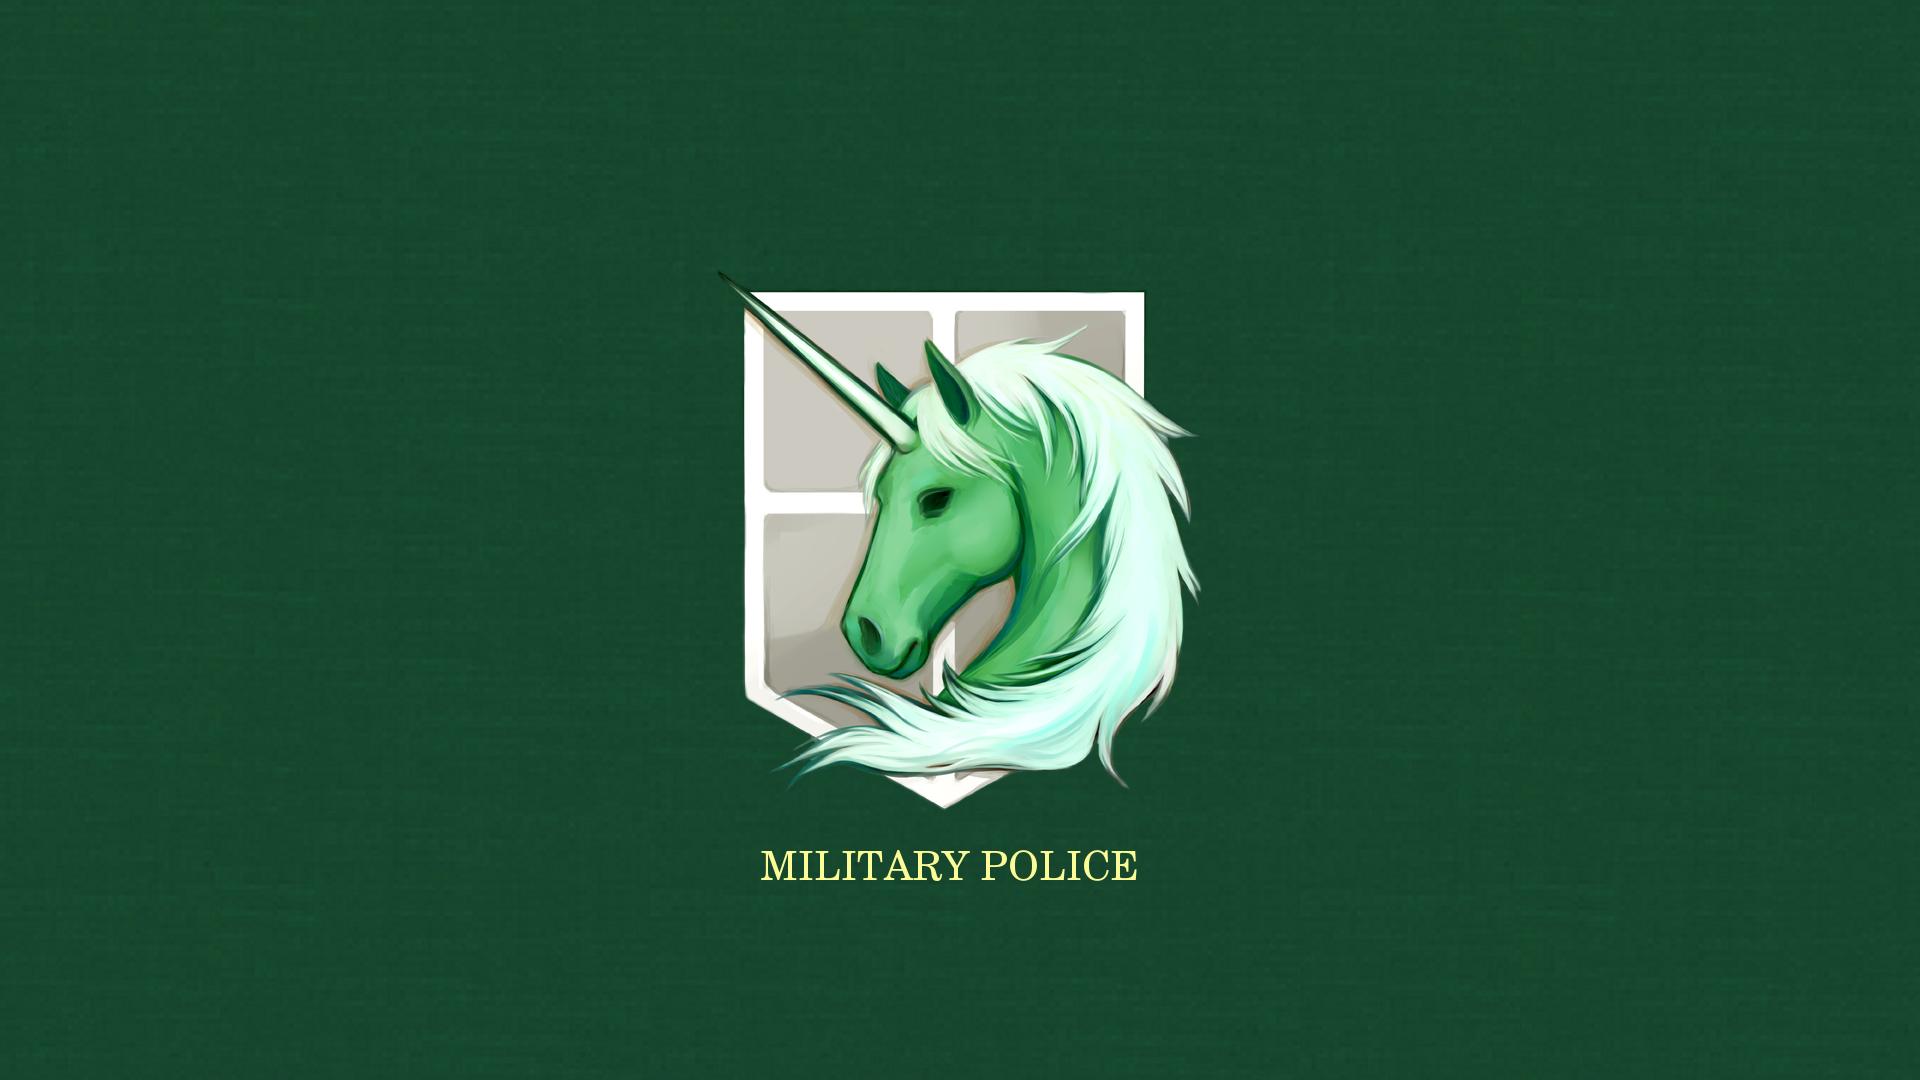 Attack On Titan Military Police Wallpaper Redux By Imxset21 On Deviantart